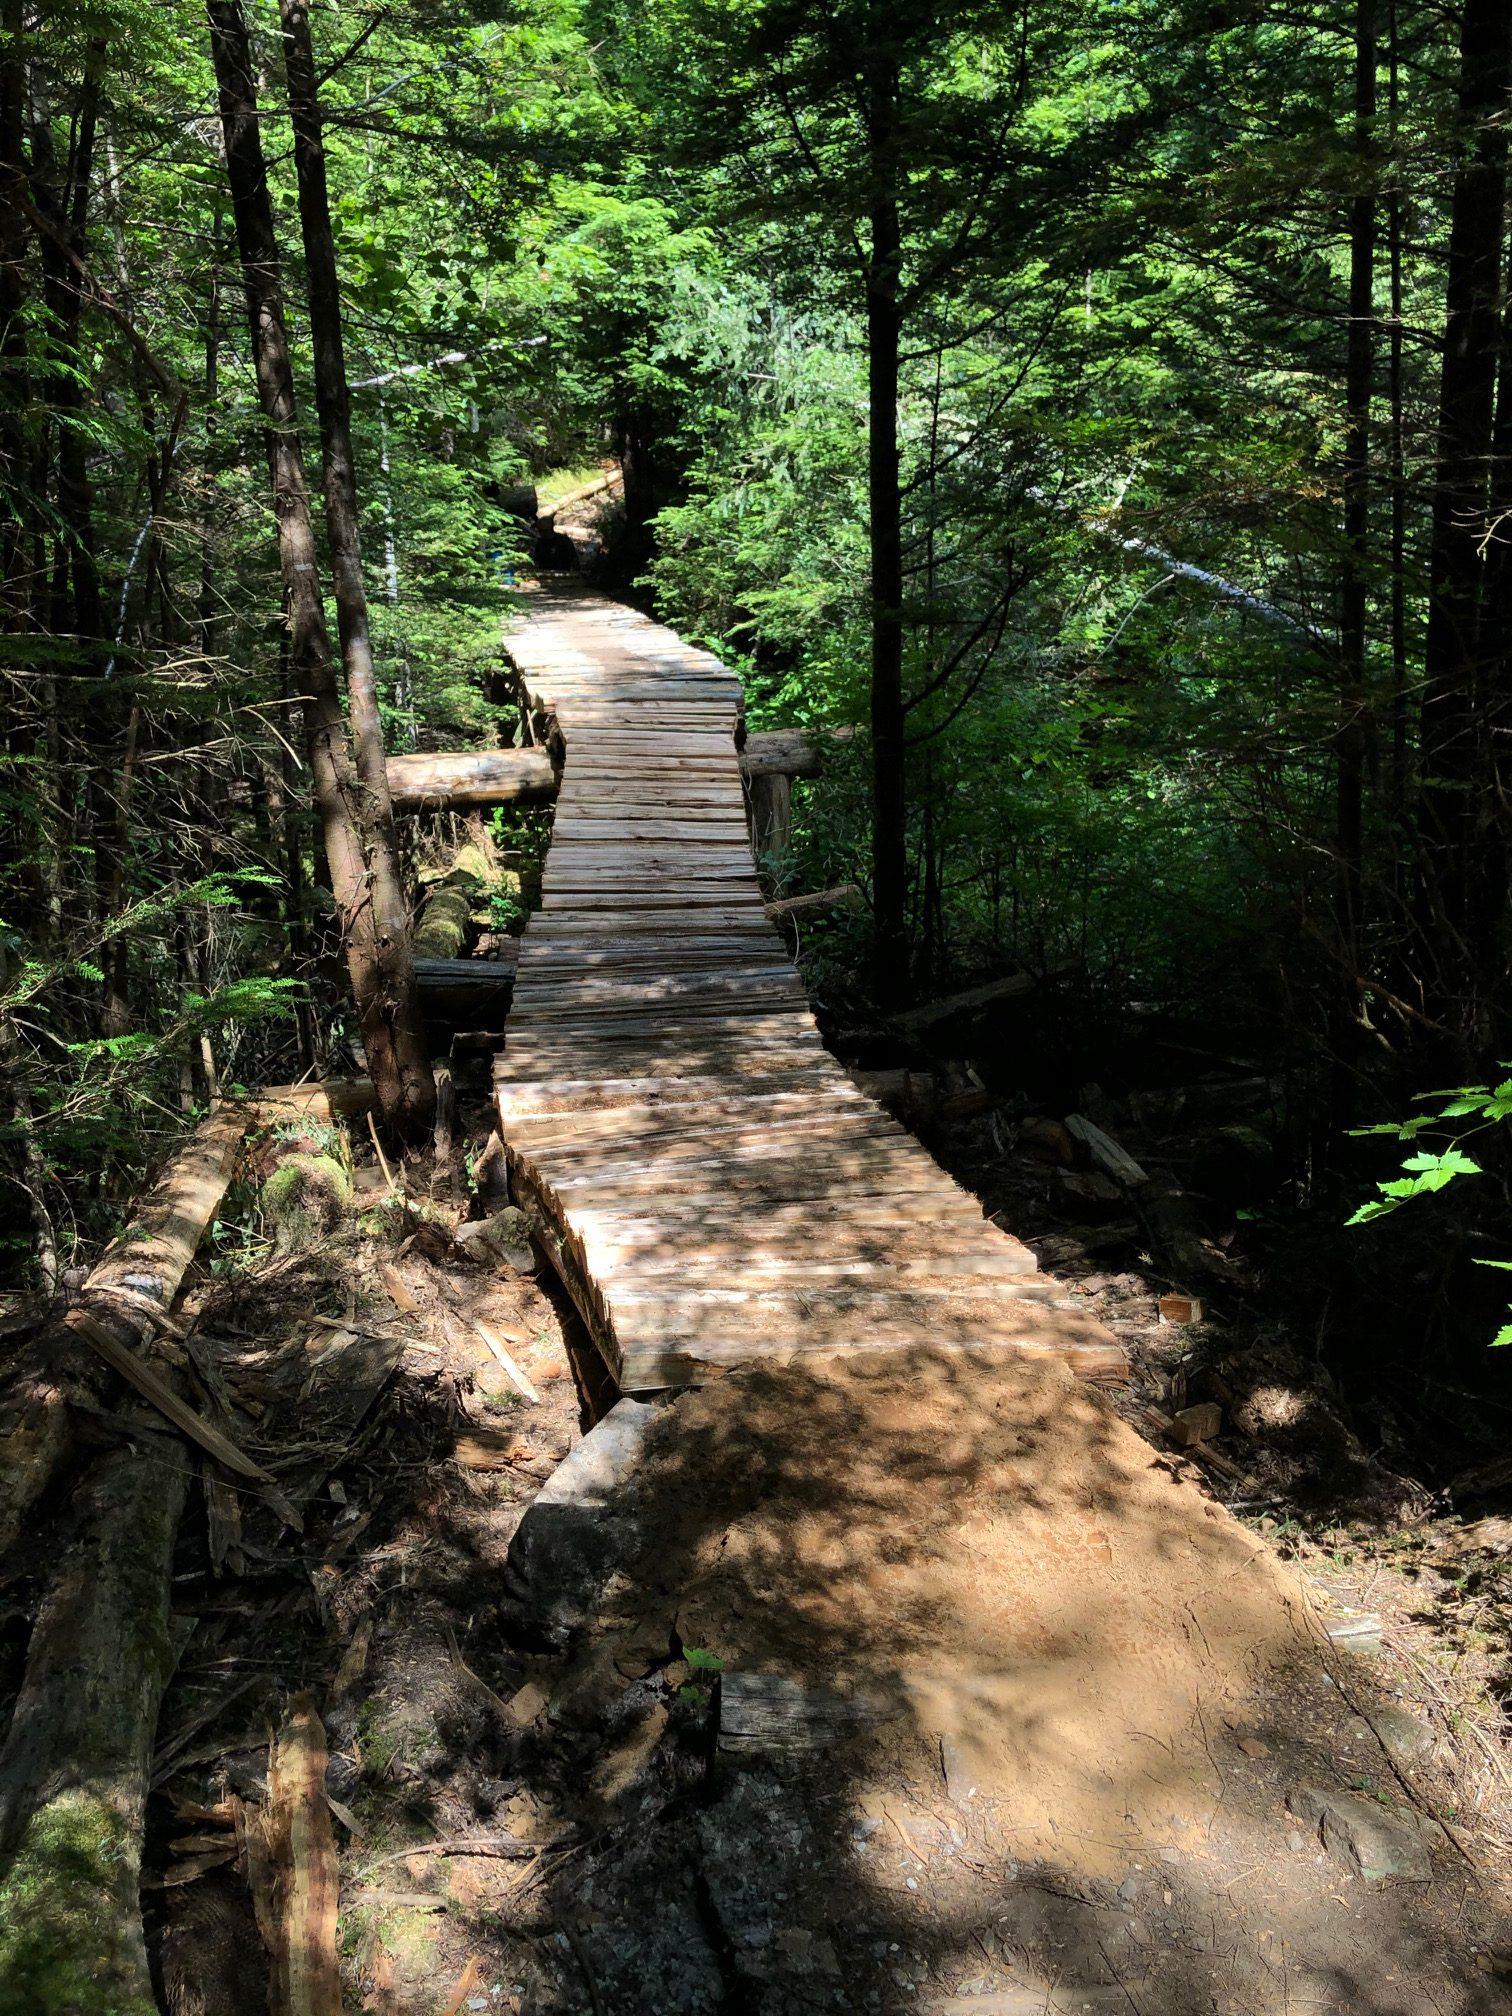 The repaired wooden bridge with fresh cedar decking